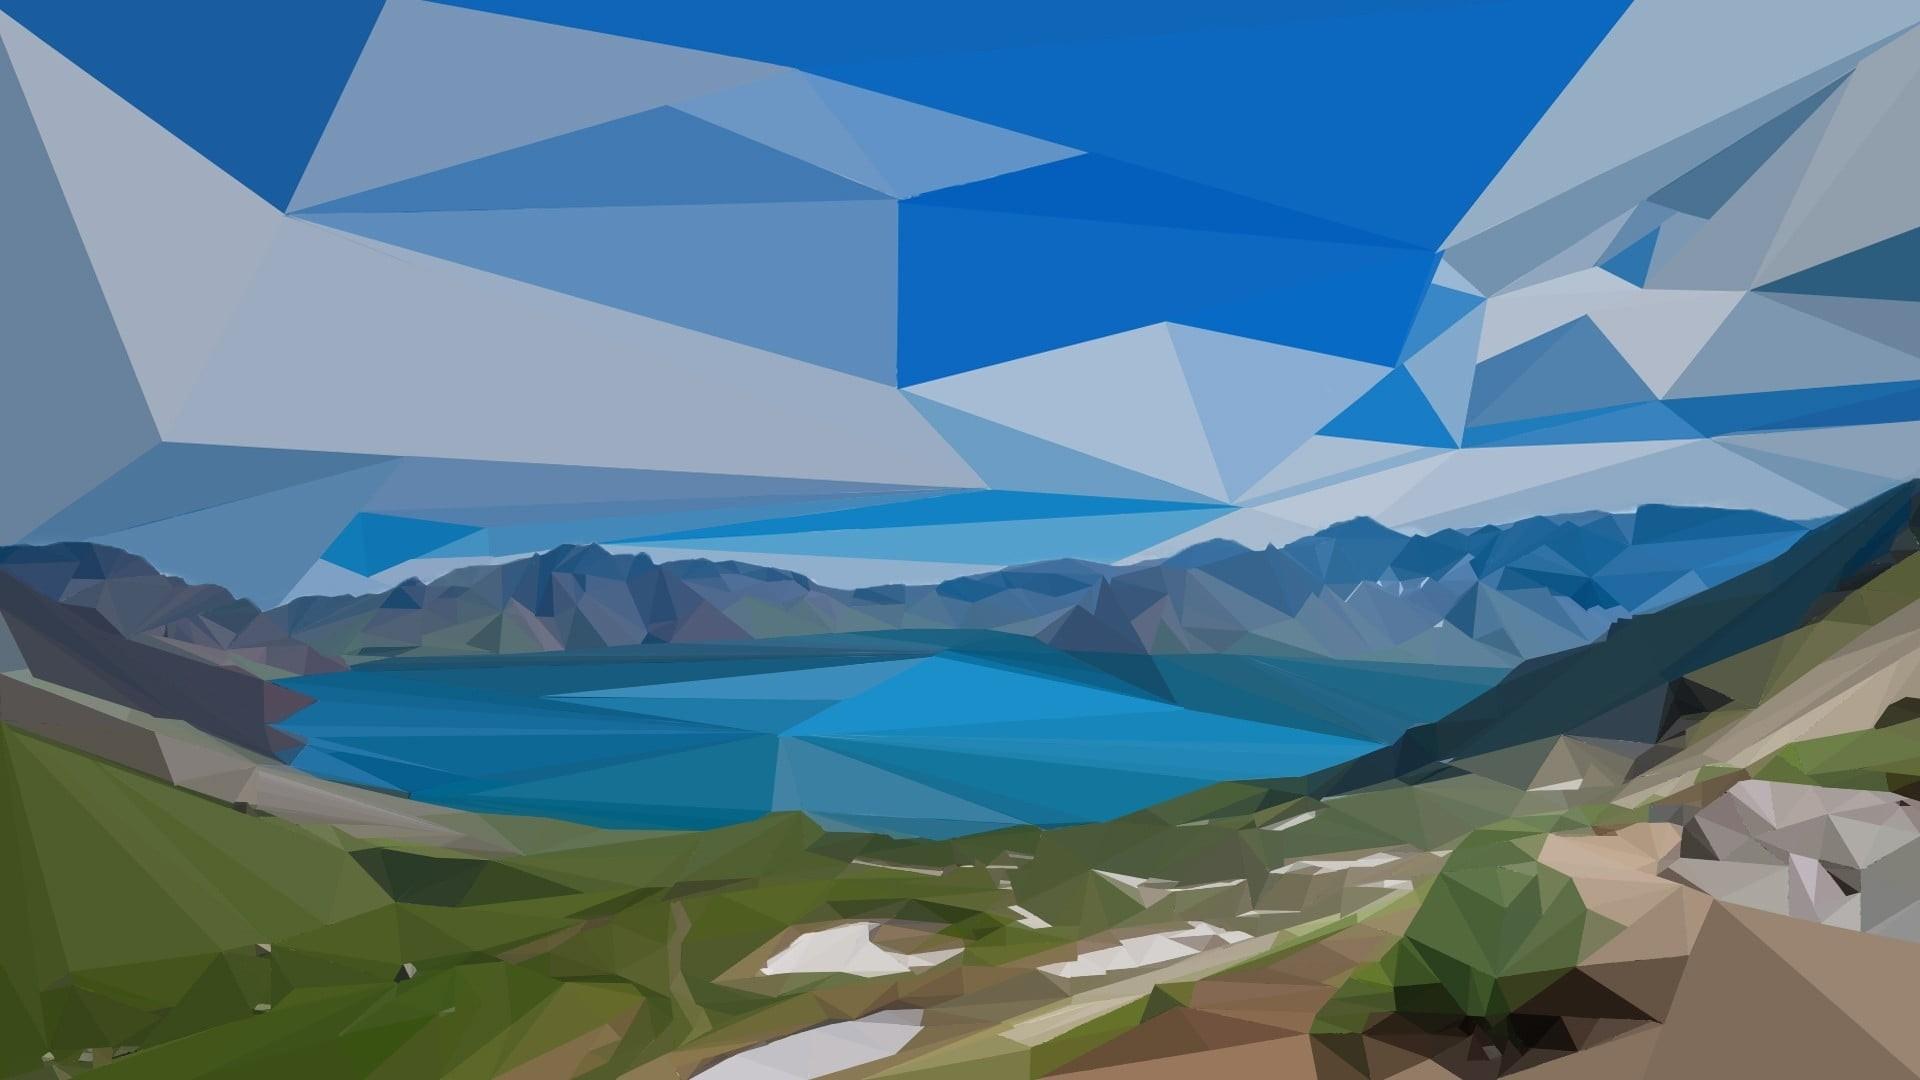 Nature Minimalist Style Desktop Wallpaper